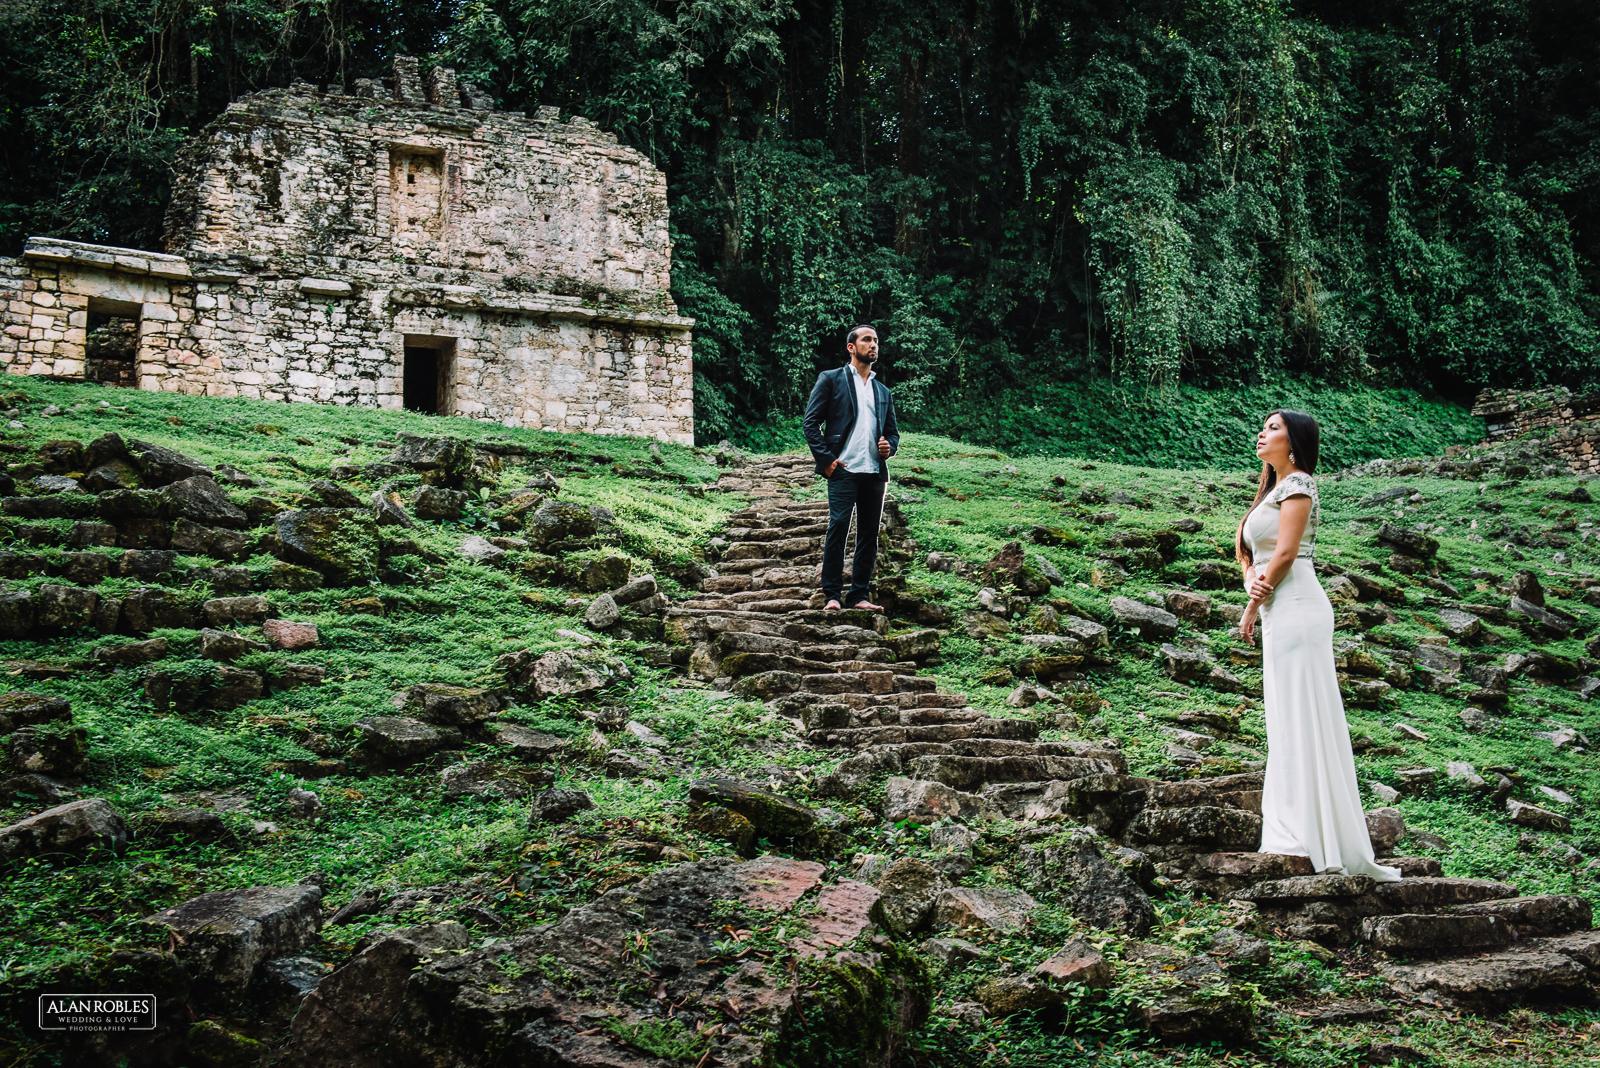 Fotografo de bodas Alan Robles-Pre boda Chiapas-26